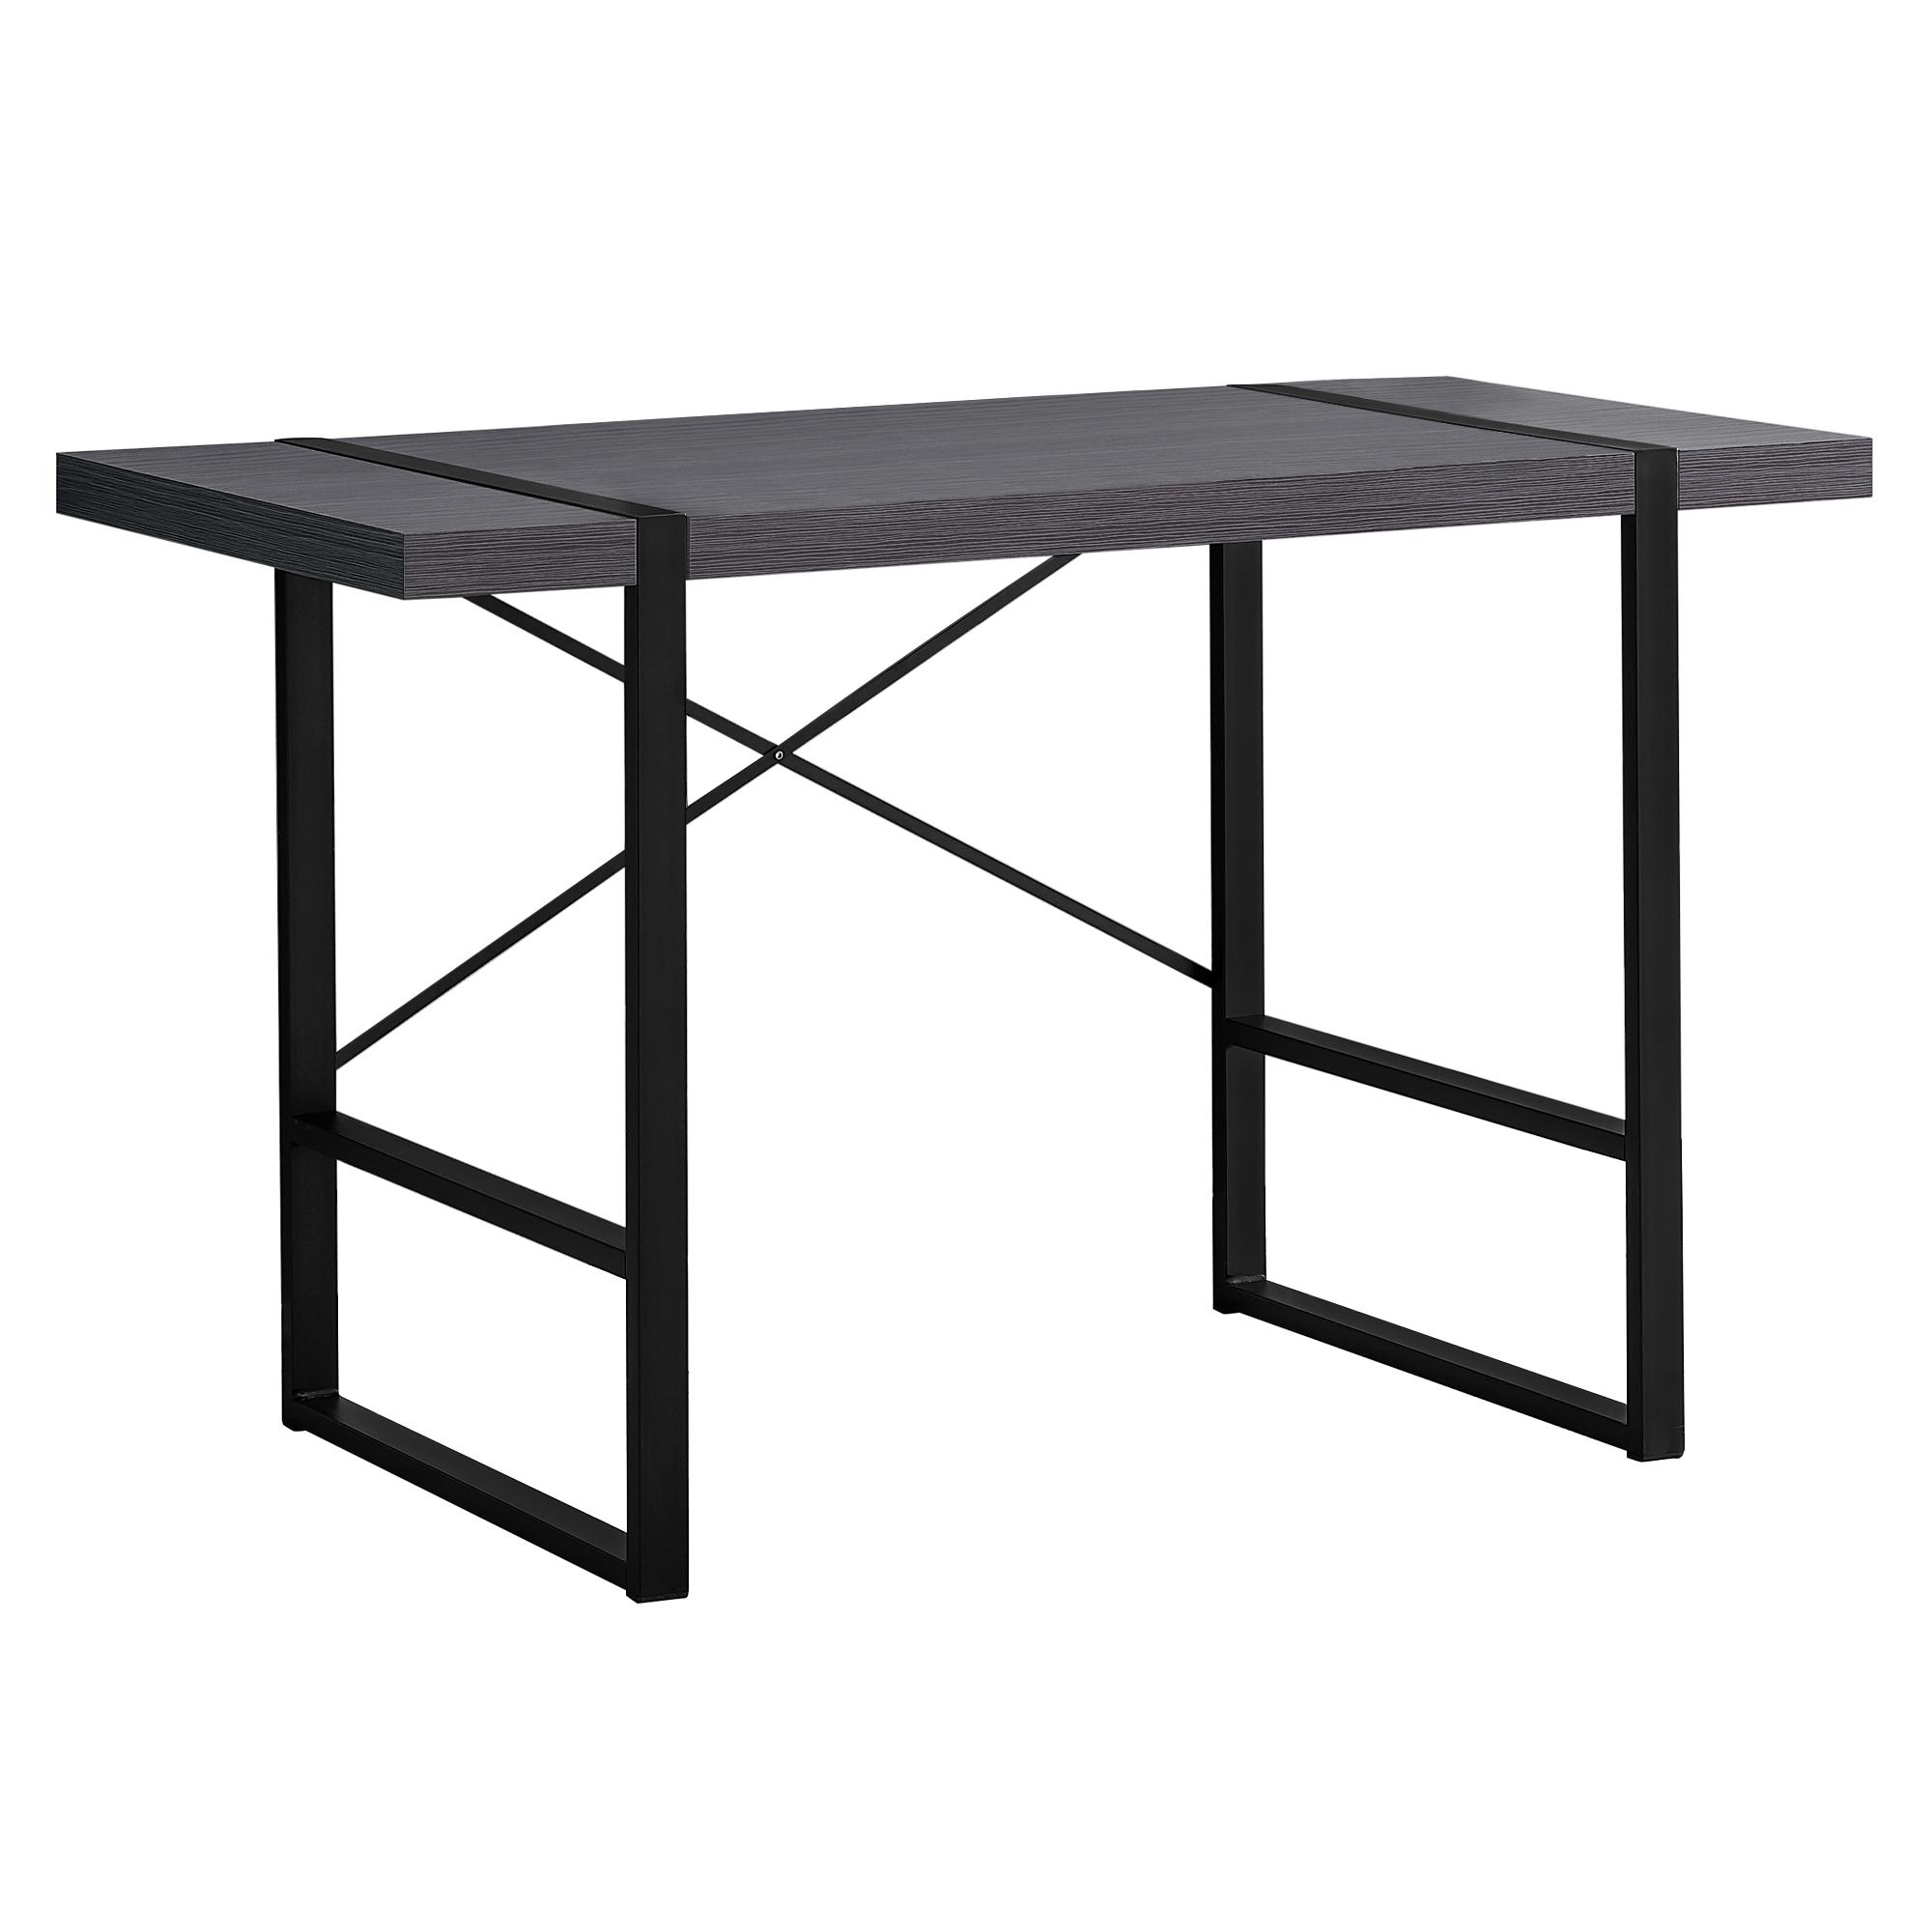 "23.75"" x 49"" x 30"" GreyBlack Metal  Computer Desk"